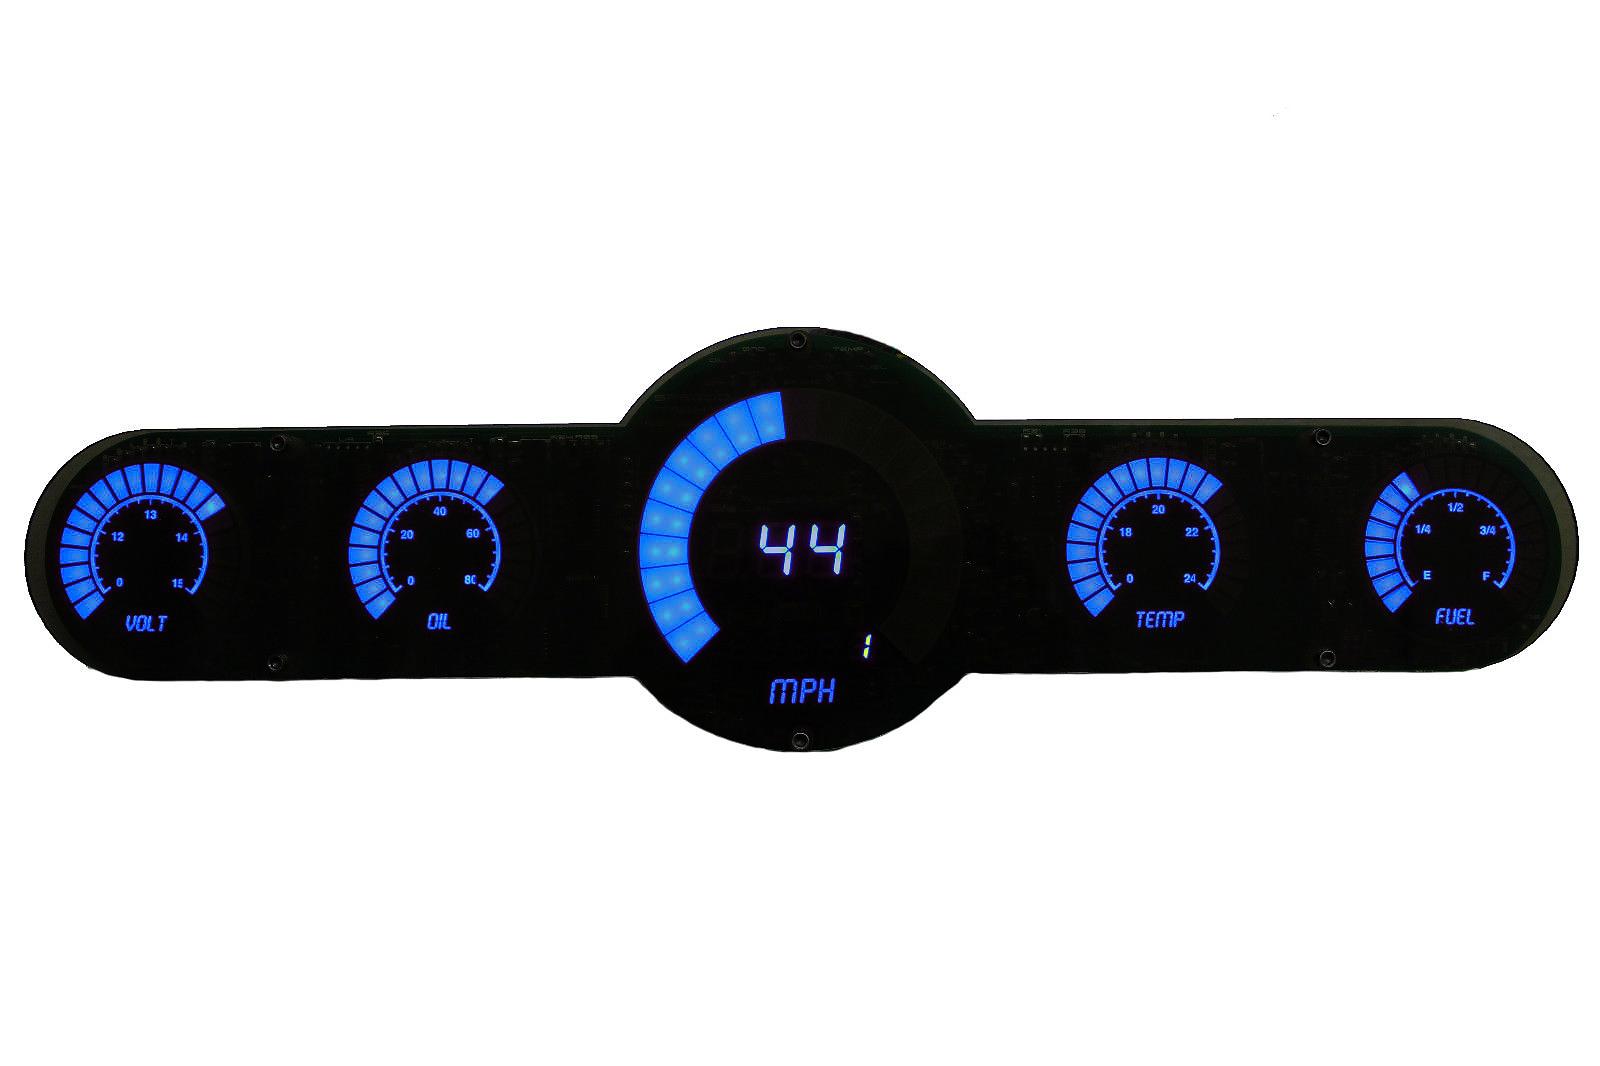 Shop Intellitronix Corp 1968 Camaro Dash Instrument Cluster Circuit Board With Tachometer 55 Gauge Bargraph Analog Panel